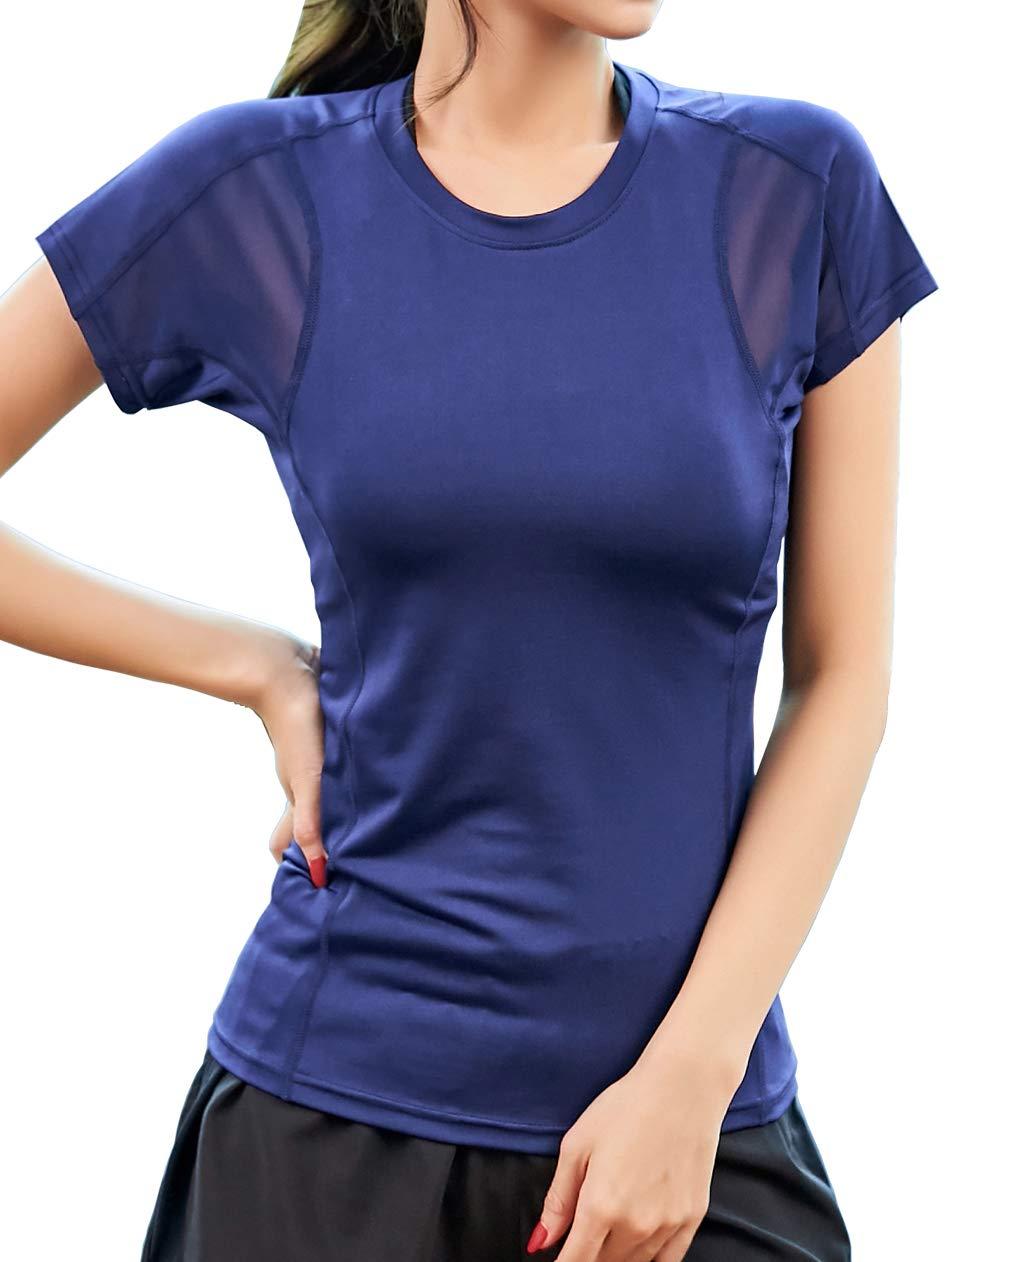 UDIY Women's Short Sleeve Athletic Tops Mesh Shirts Sports Yoga Tee Shirts, Blue, M by UDIY